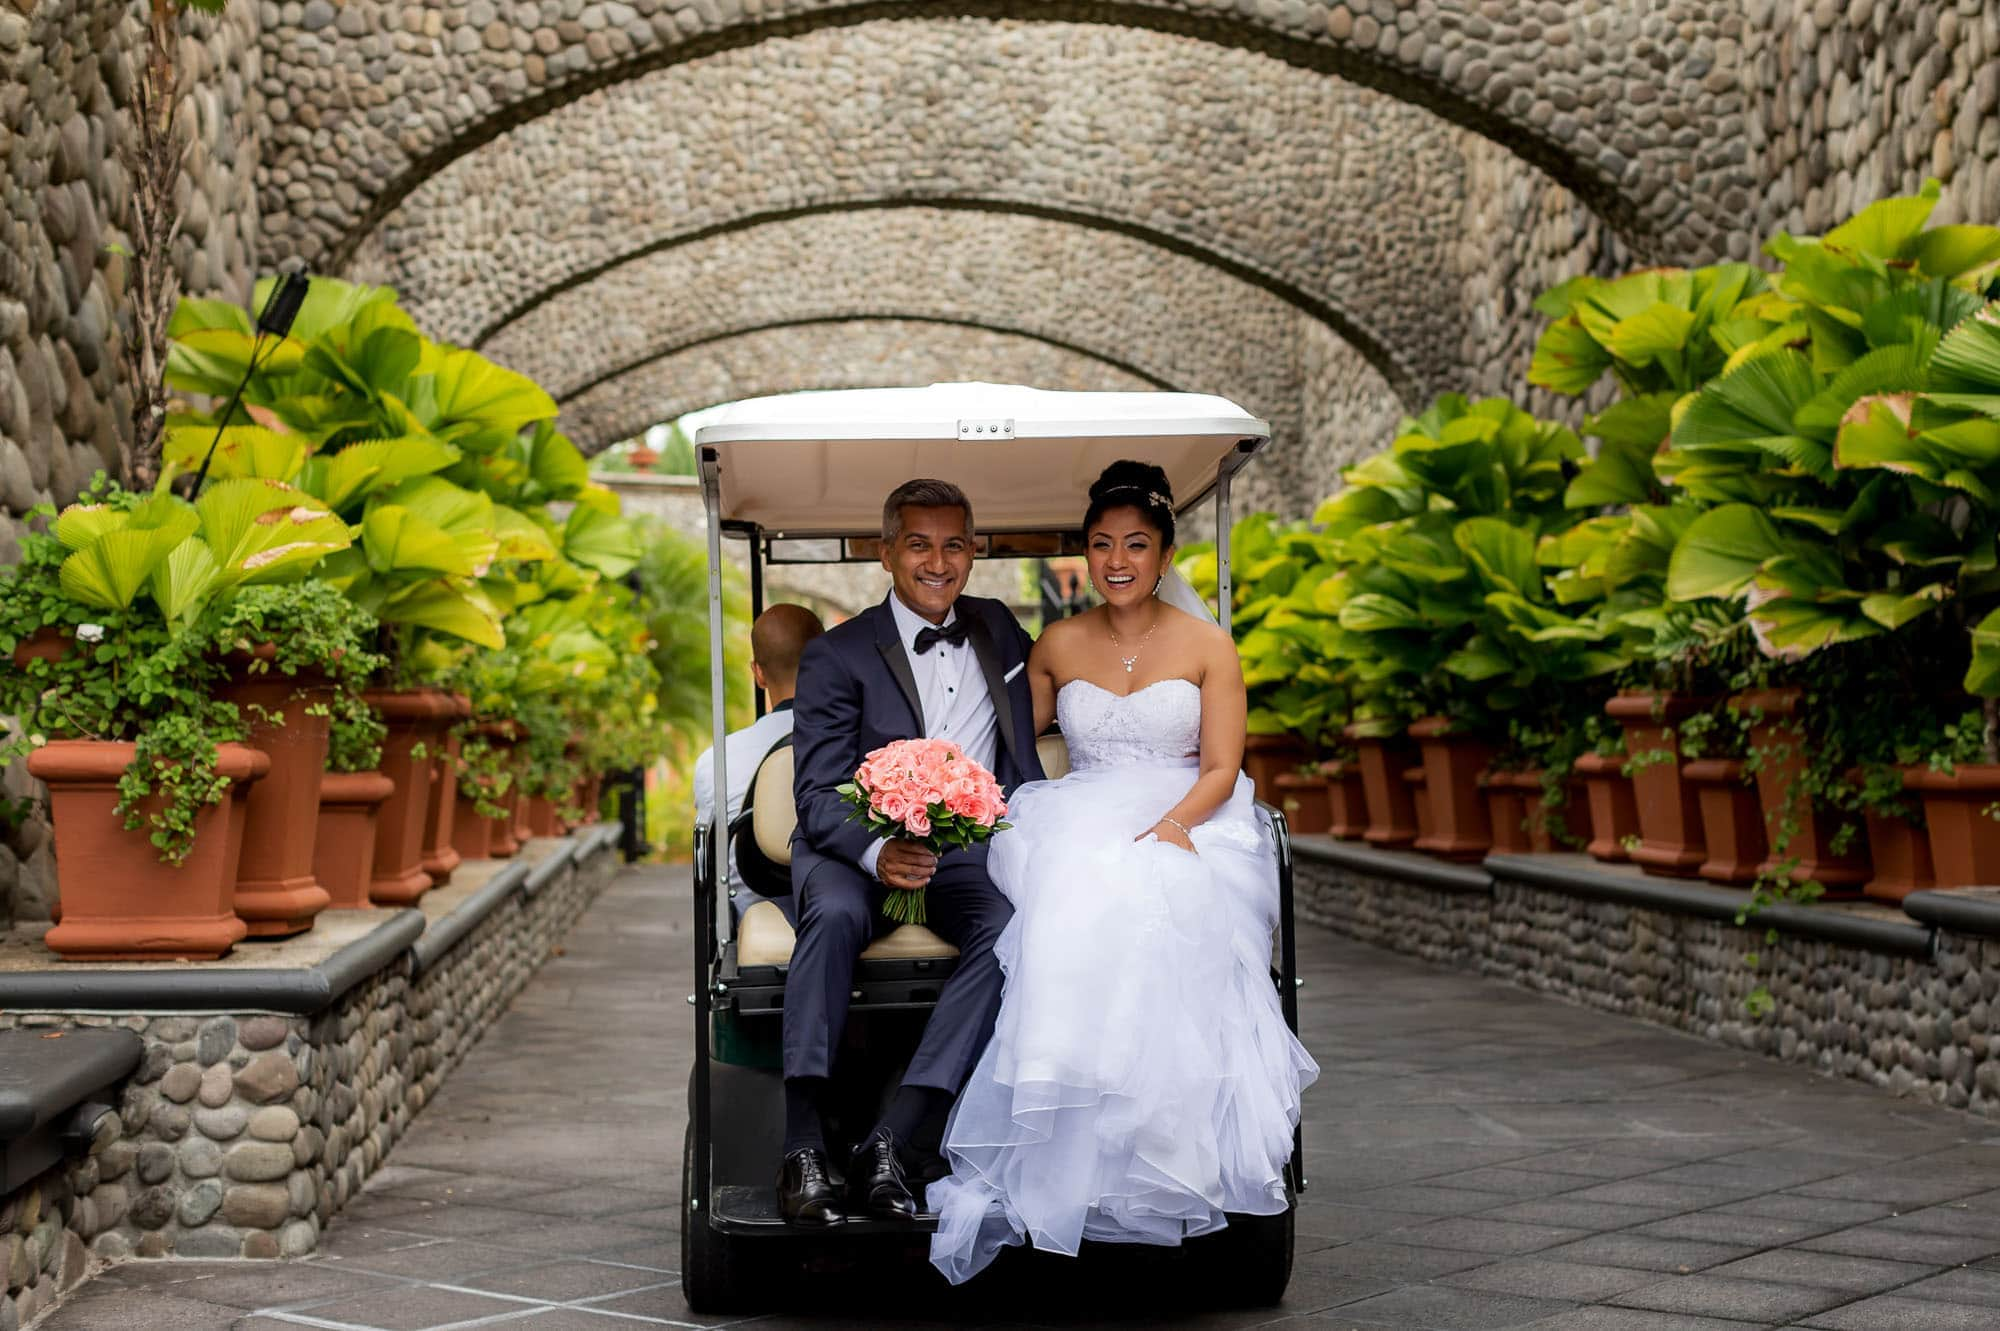 Heading to the symbolic wedding ceremony